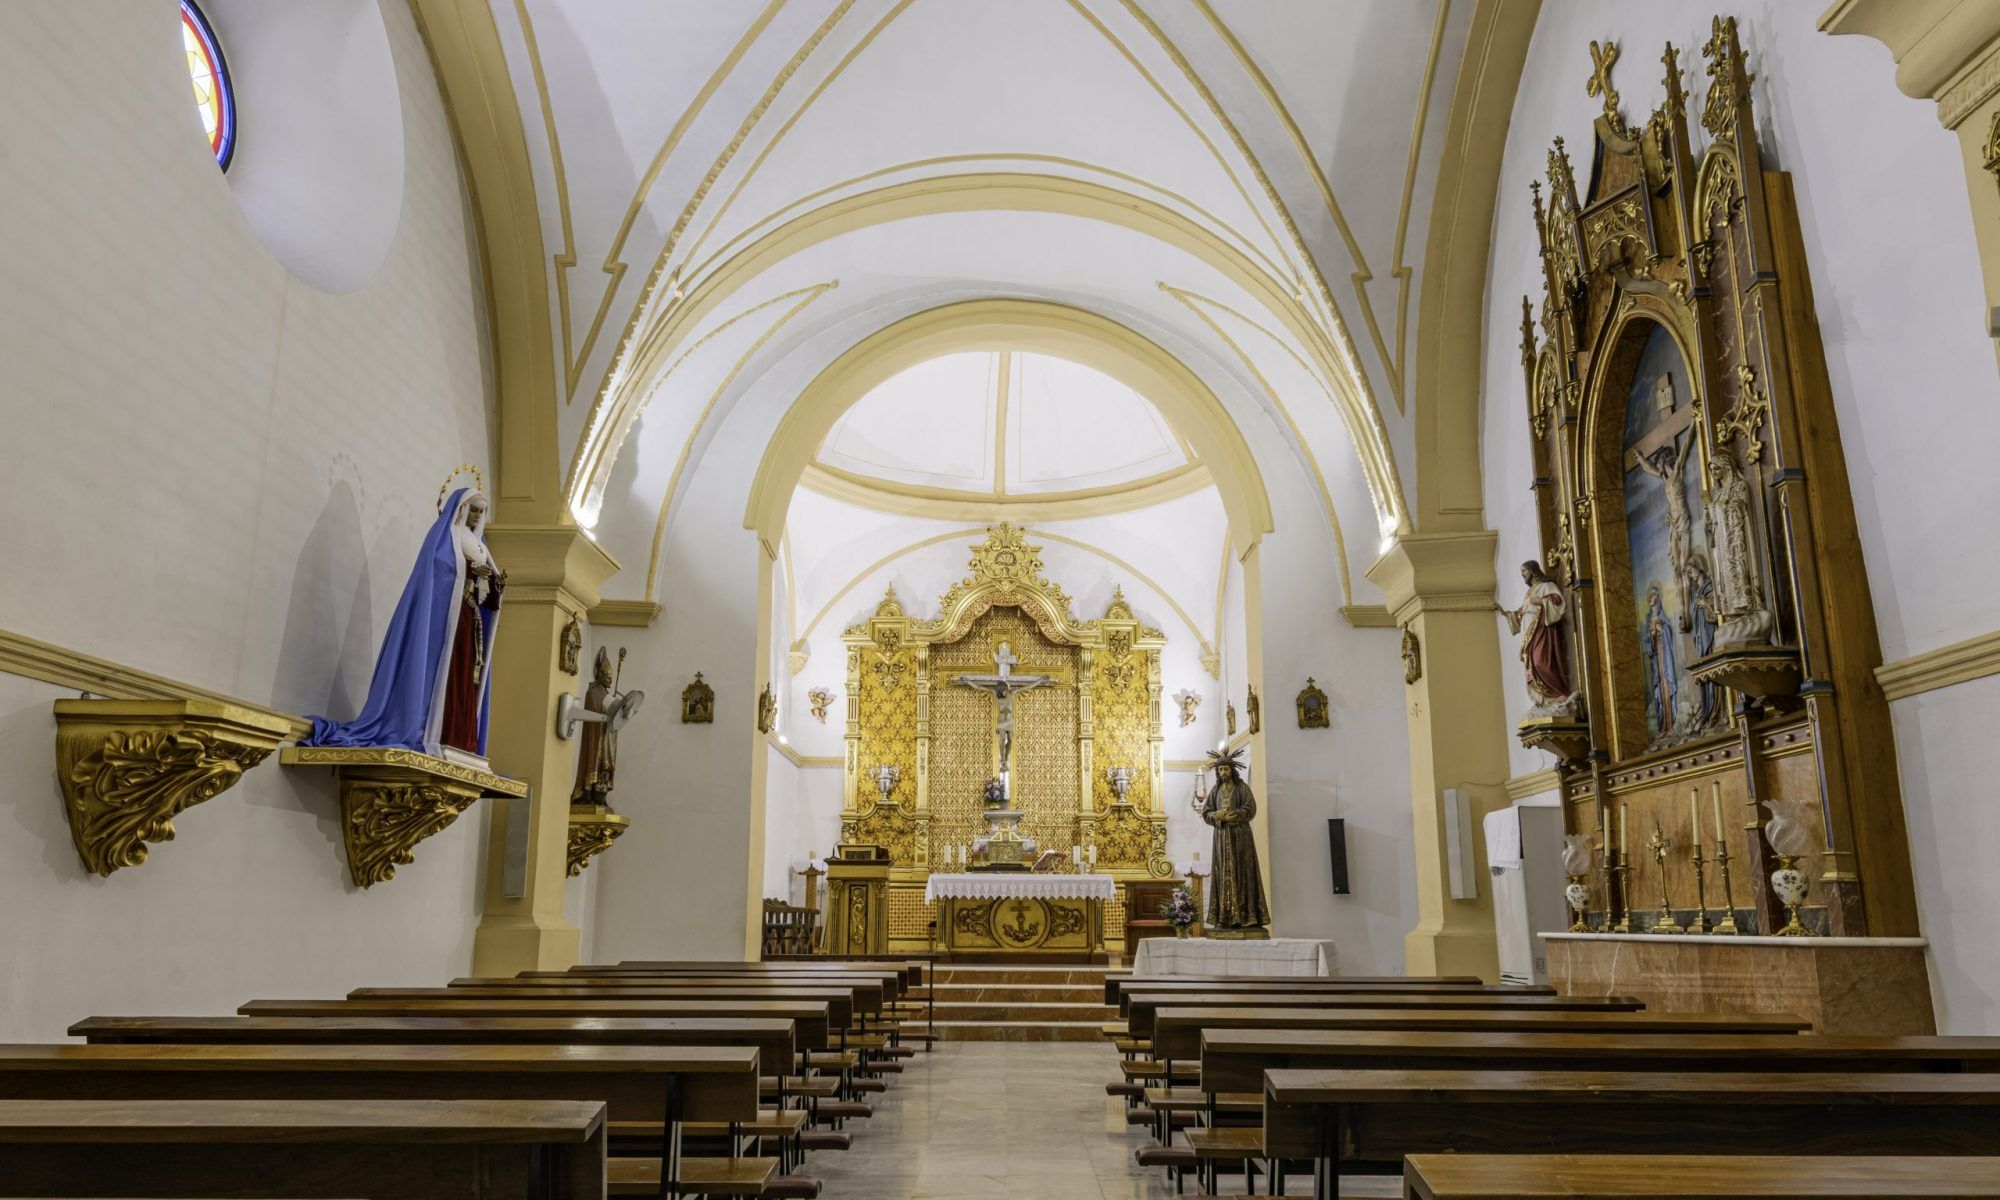 Villanueva del Arzobispo